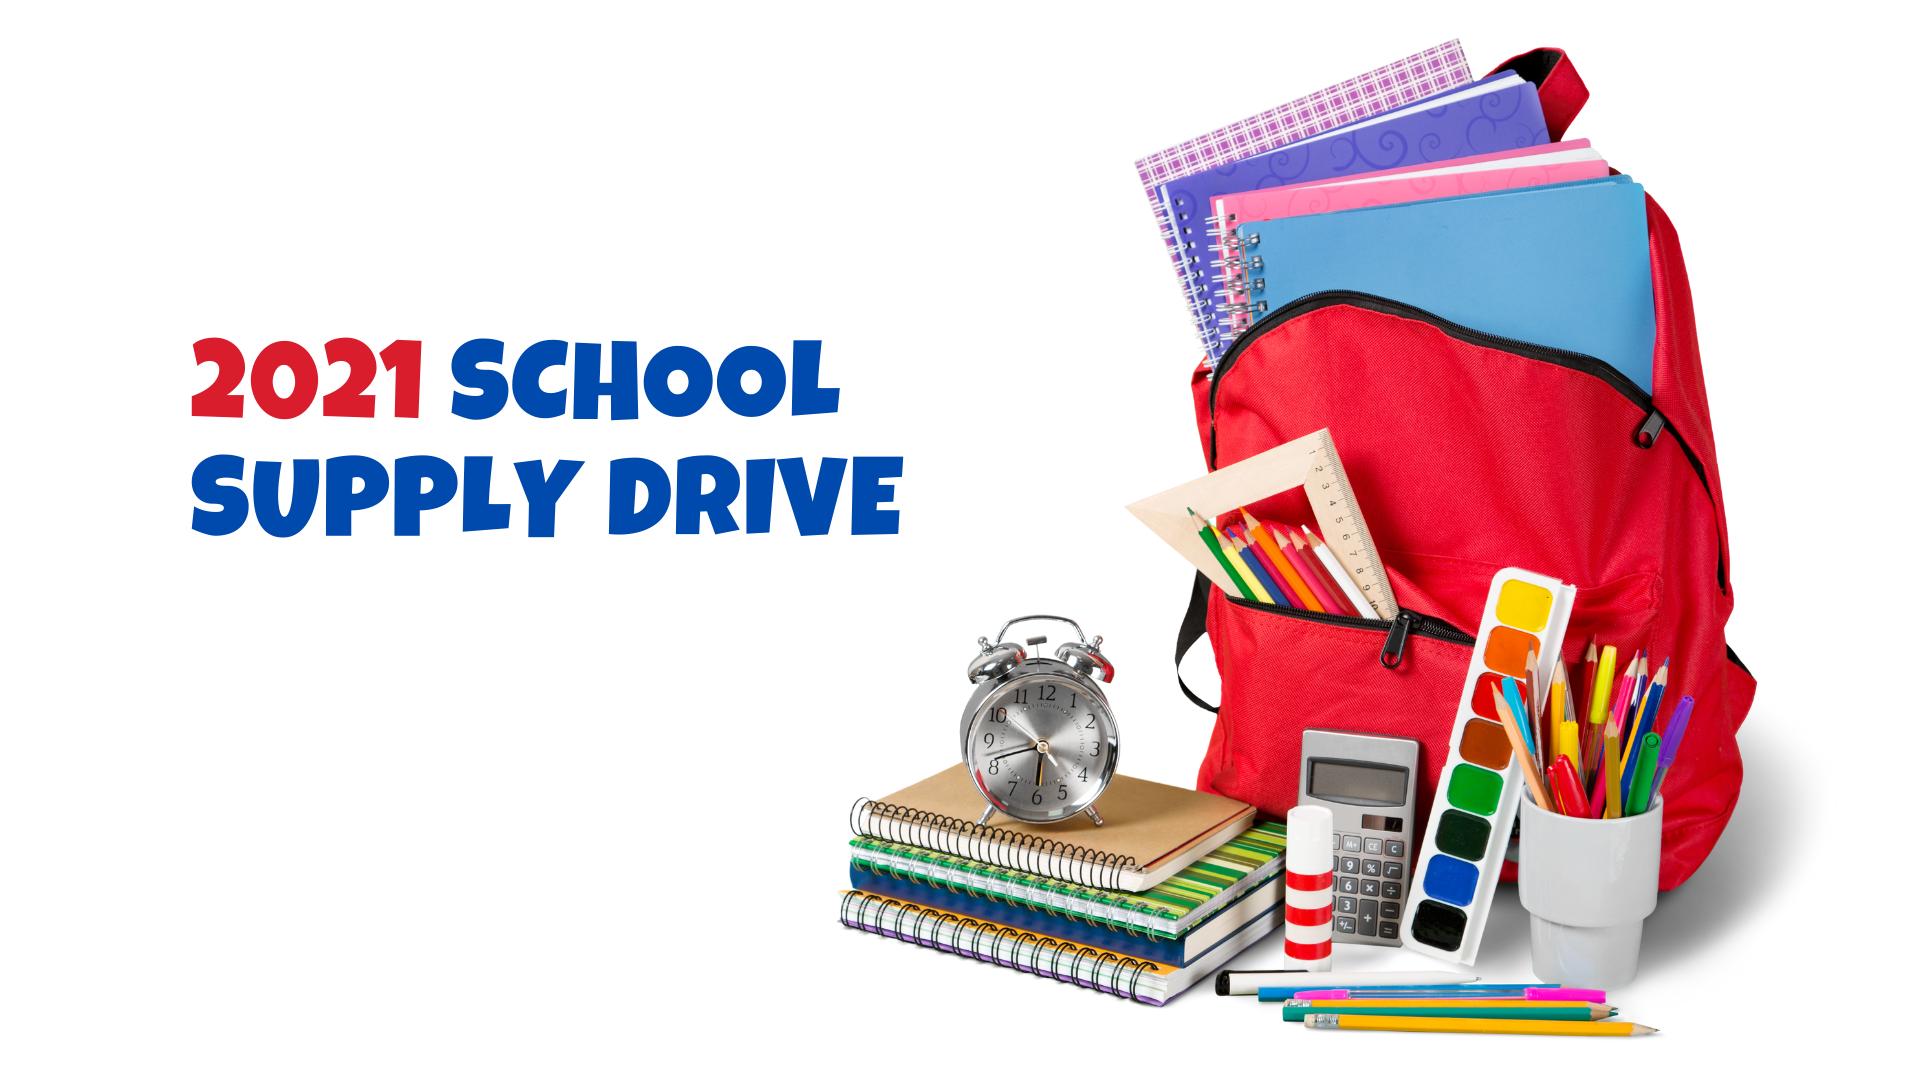 2021 School Supply Drive Announcement.